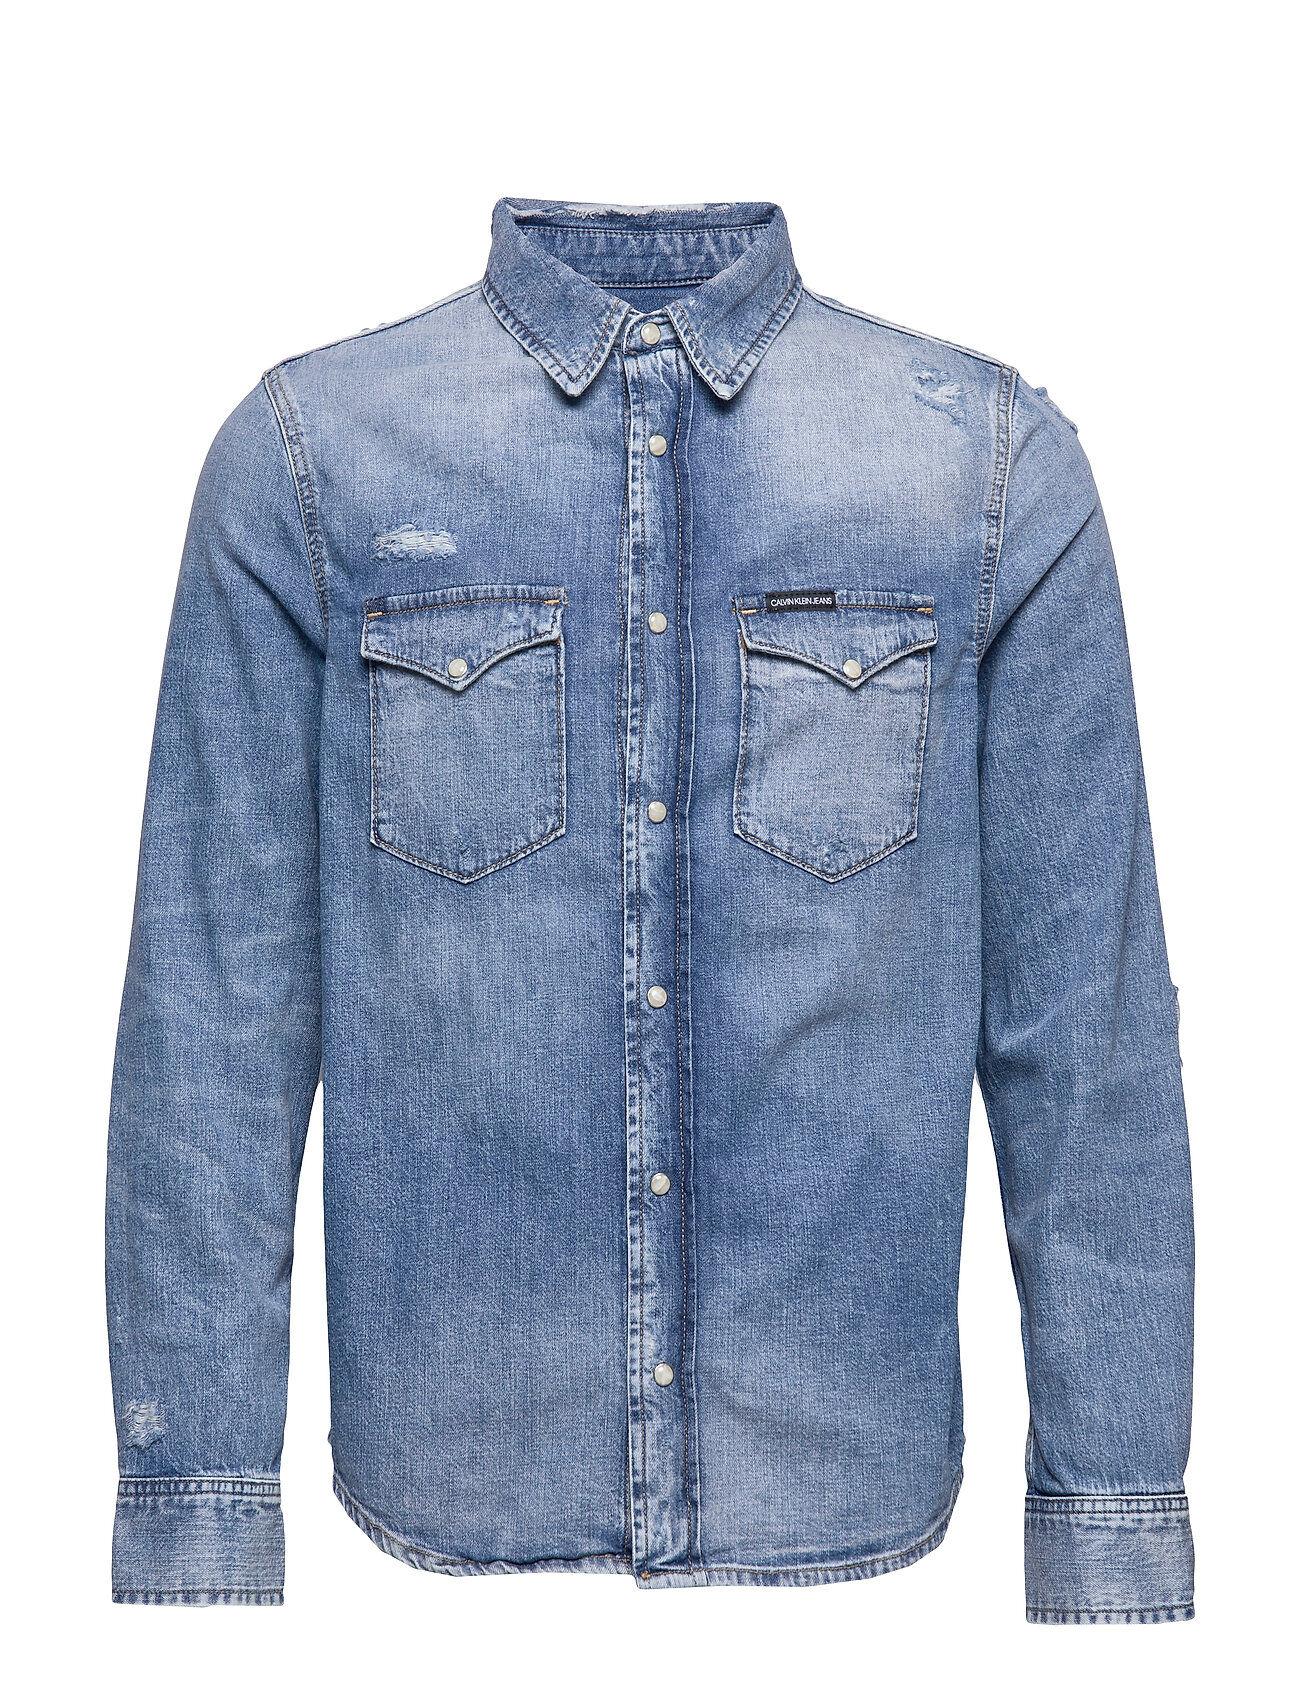 Image of Calvin Modern Western Shirt Paita Rento Casual Sininen Calvin Klein Jeans